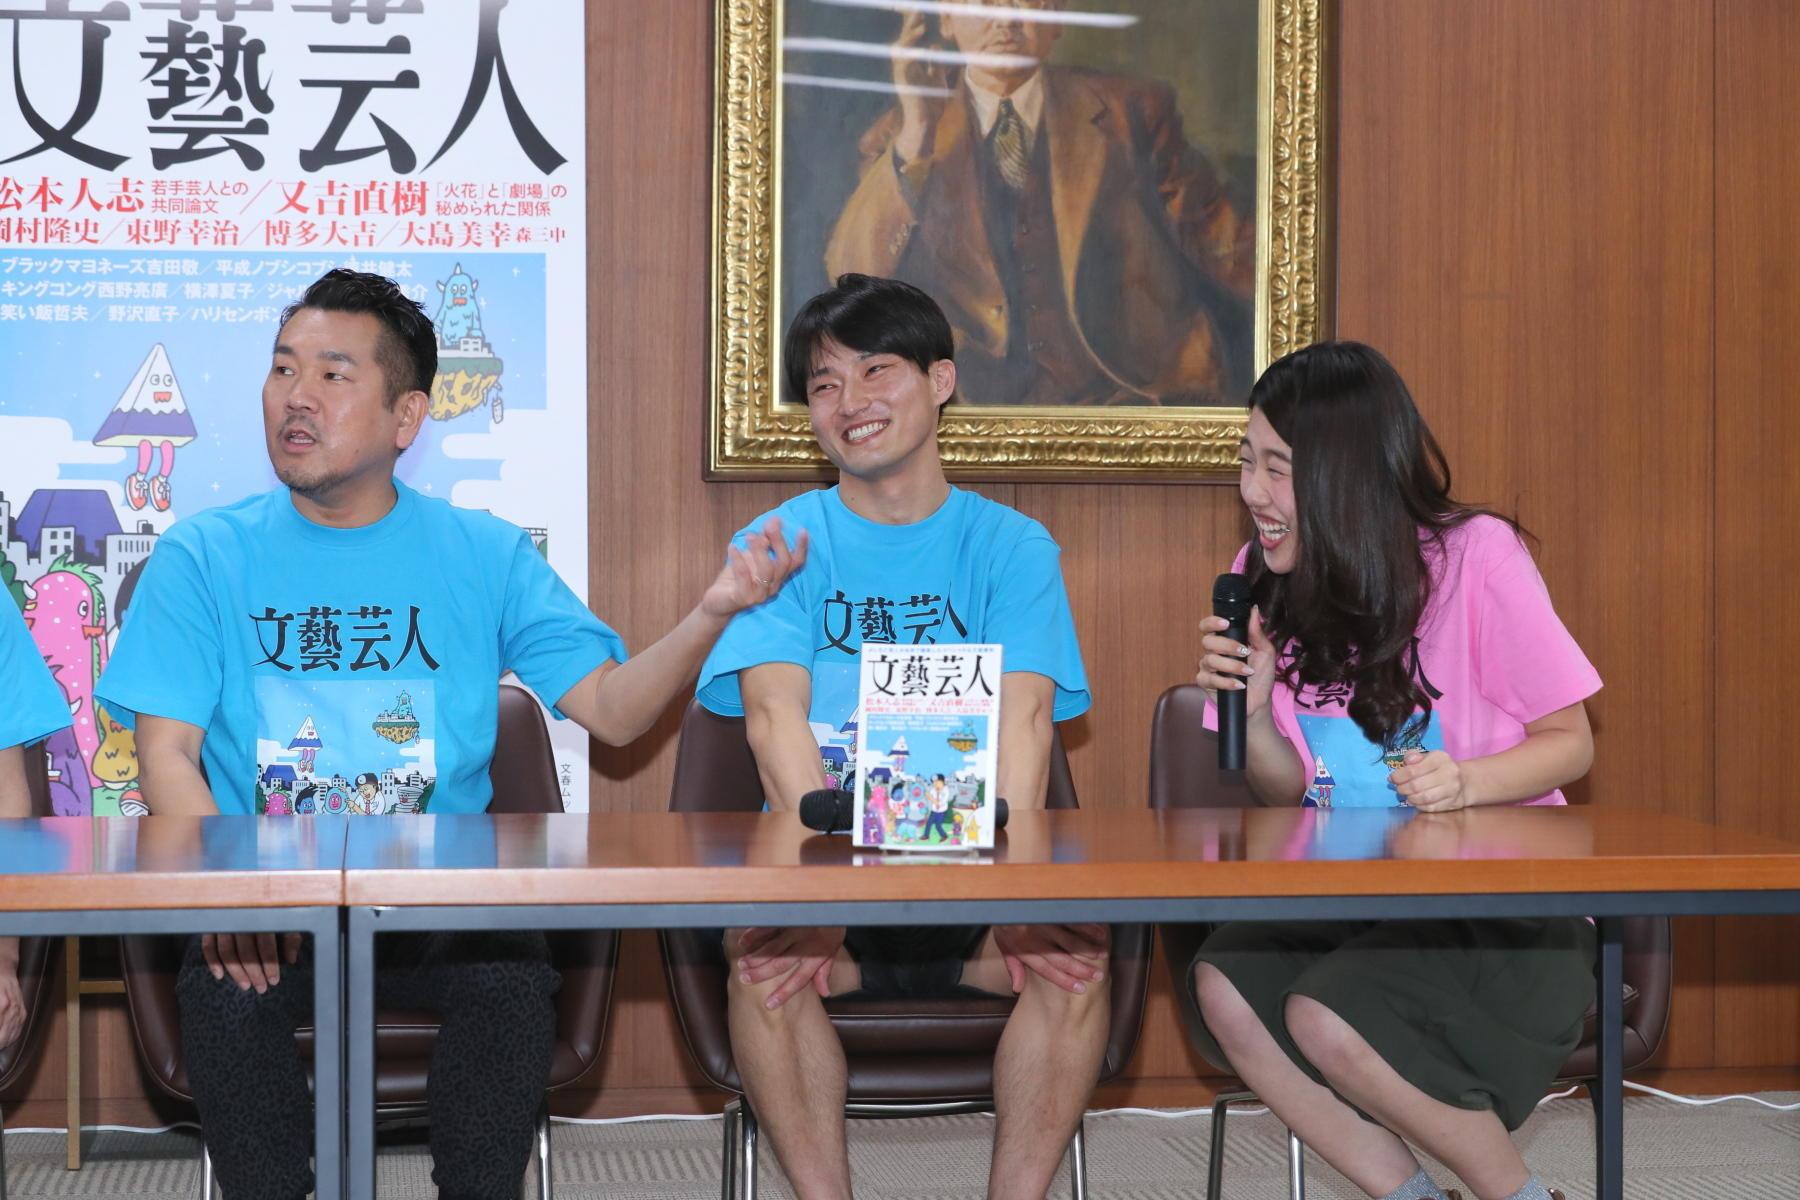 http://news.yoshimoto.co.jp/20170316201838-741d5fed26256eee93d358a1b4d137a22b85919e.jpg